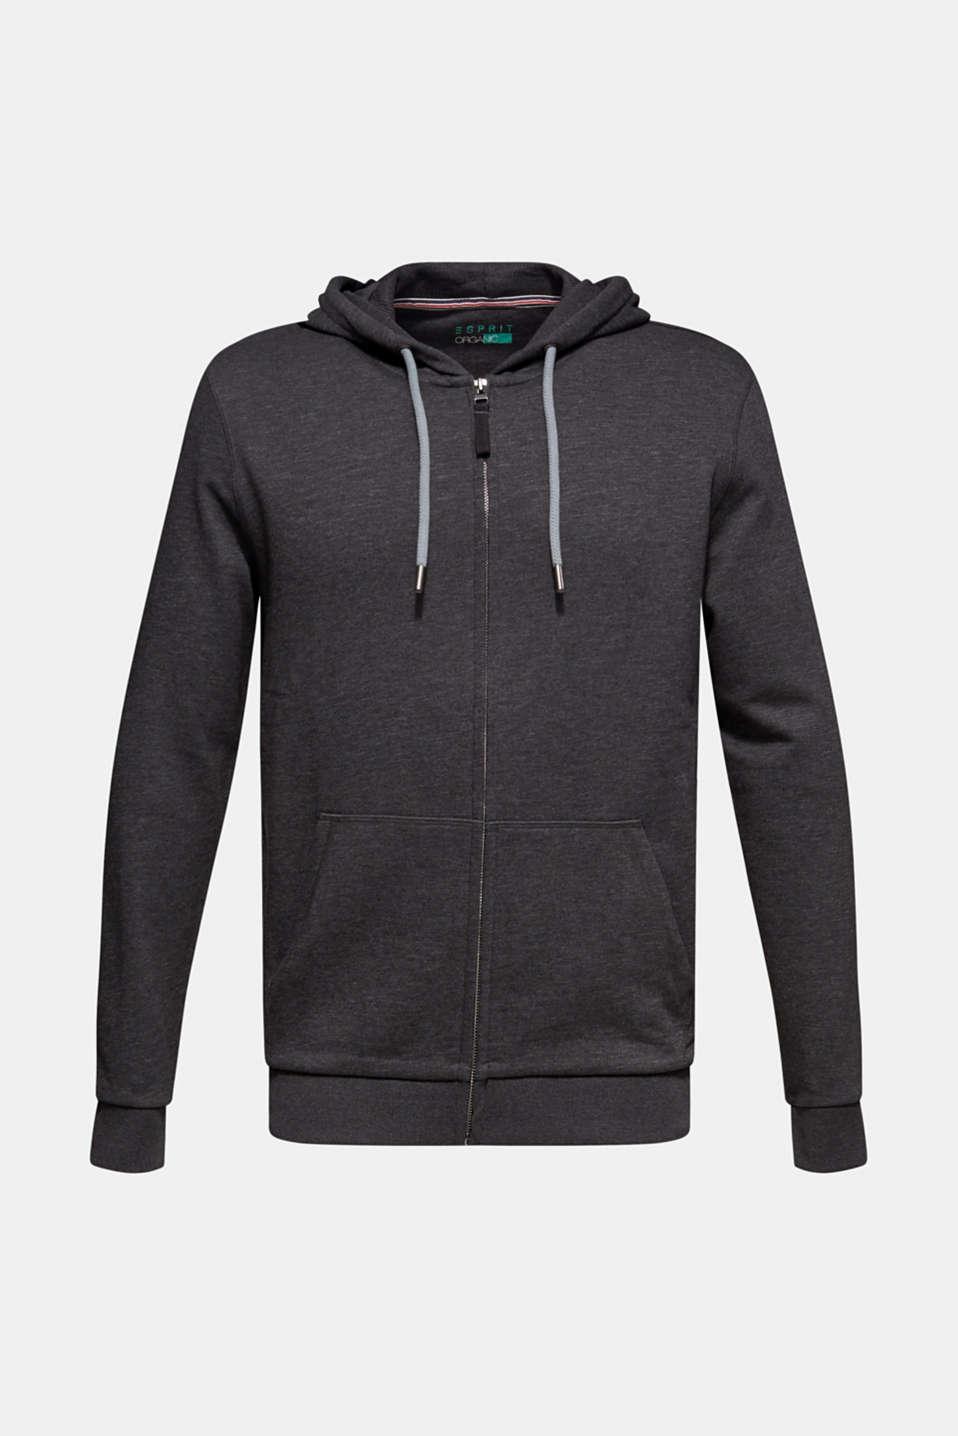 Hooded sweatshirt cardigan, ANTHRACITE, detail image number 6